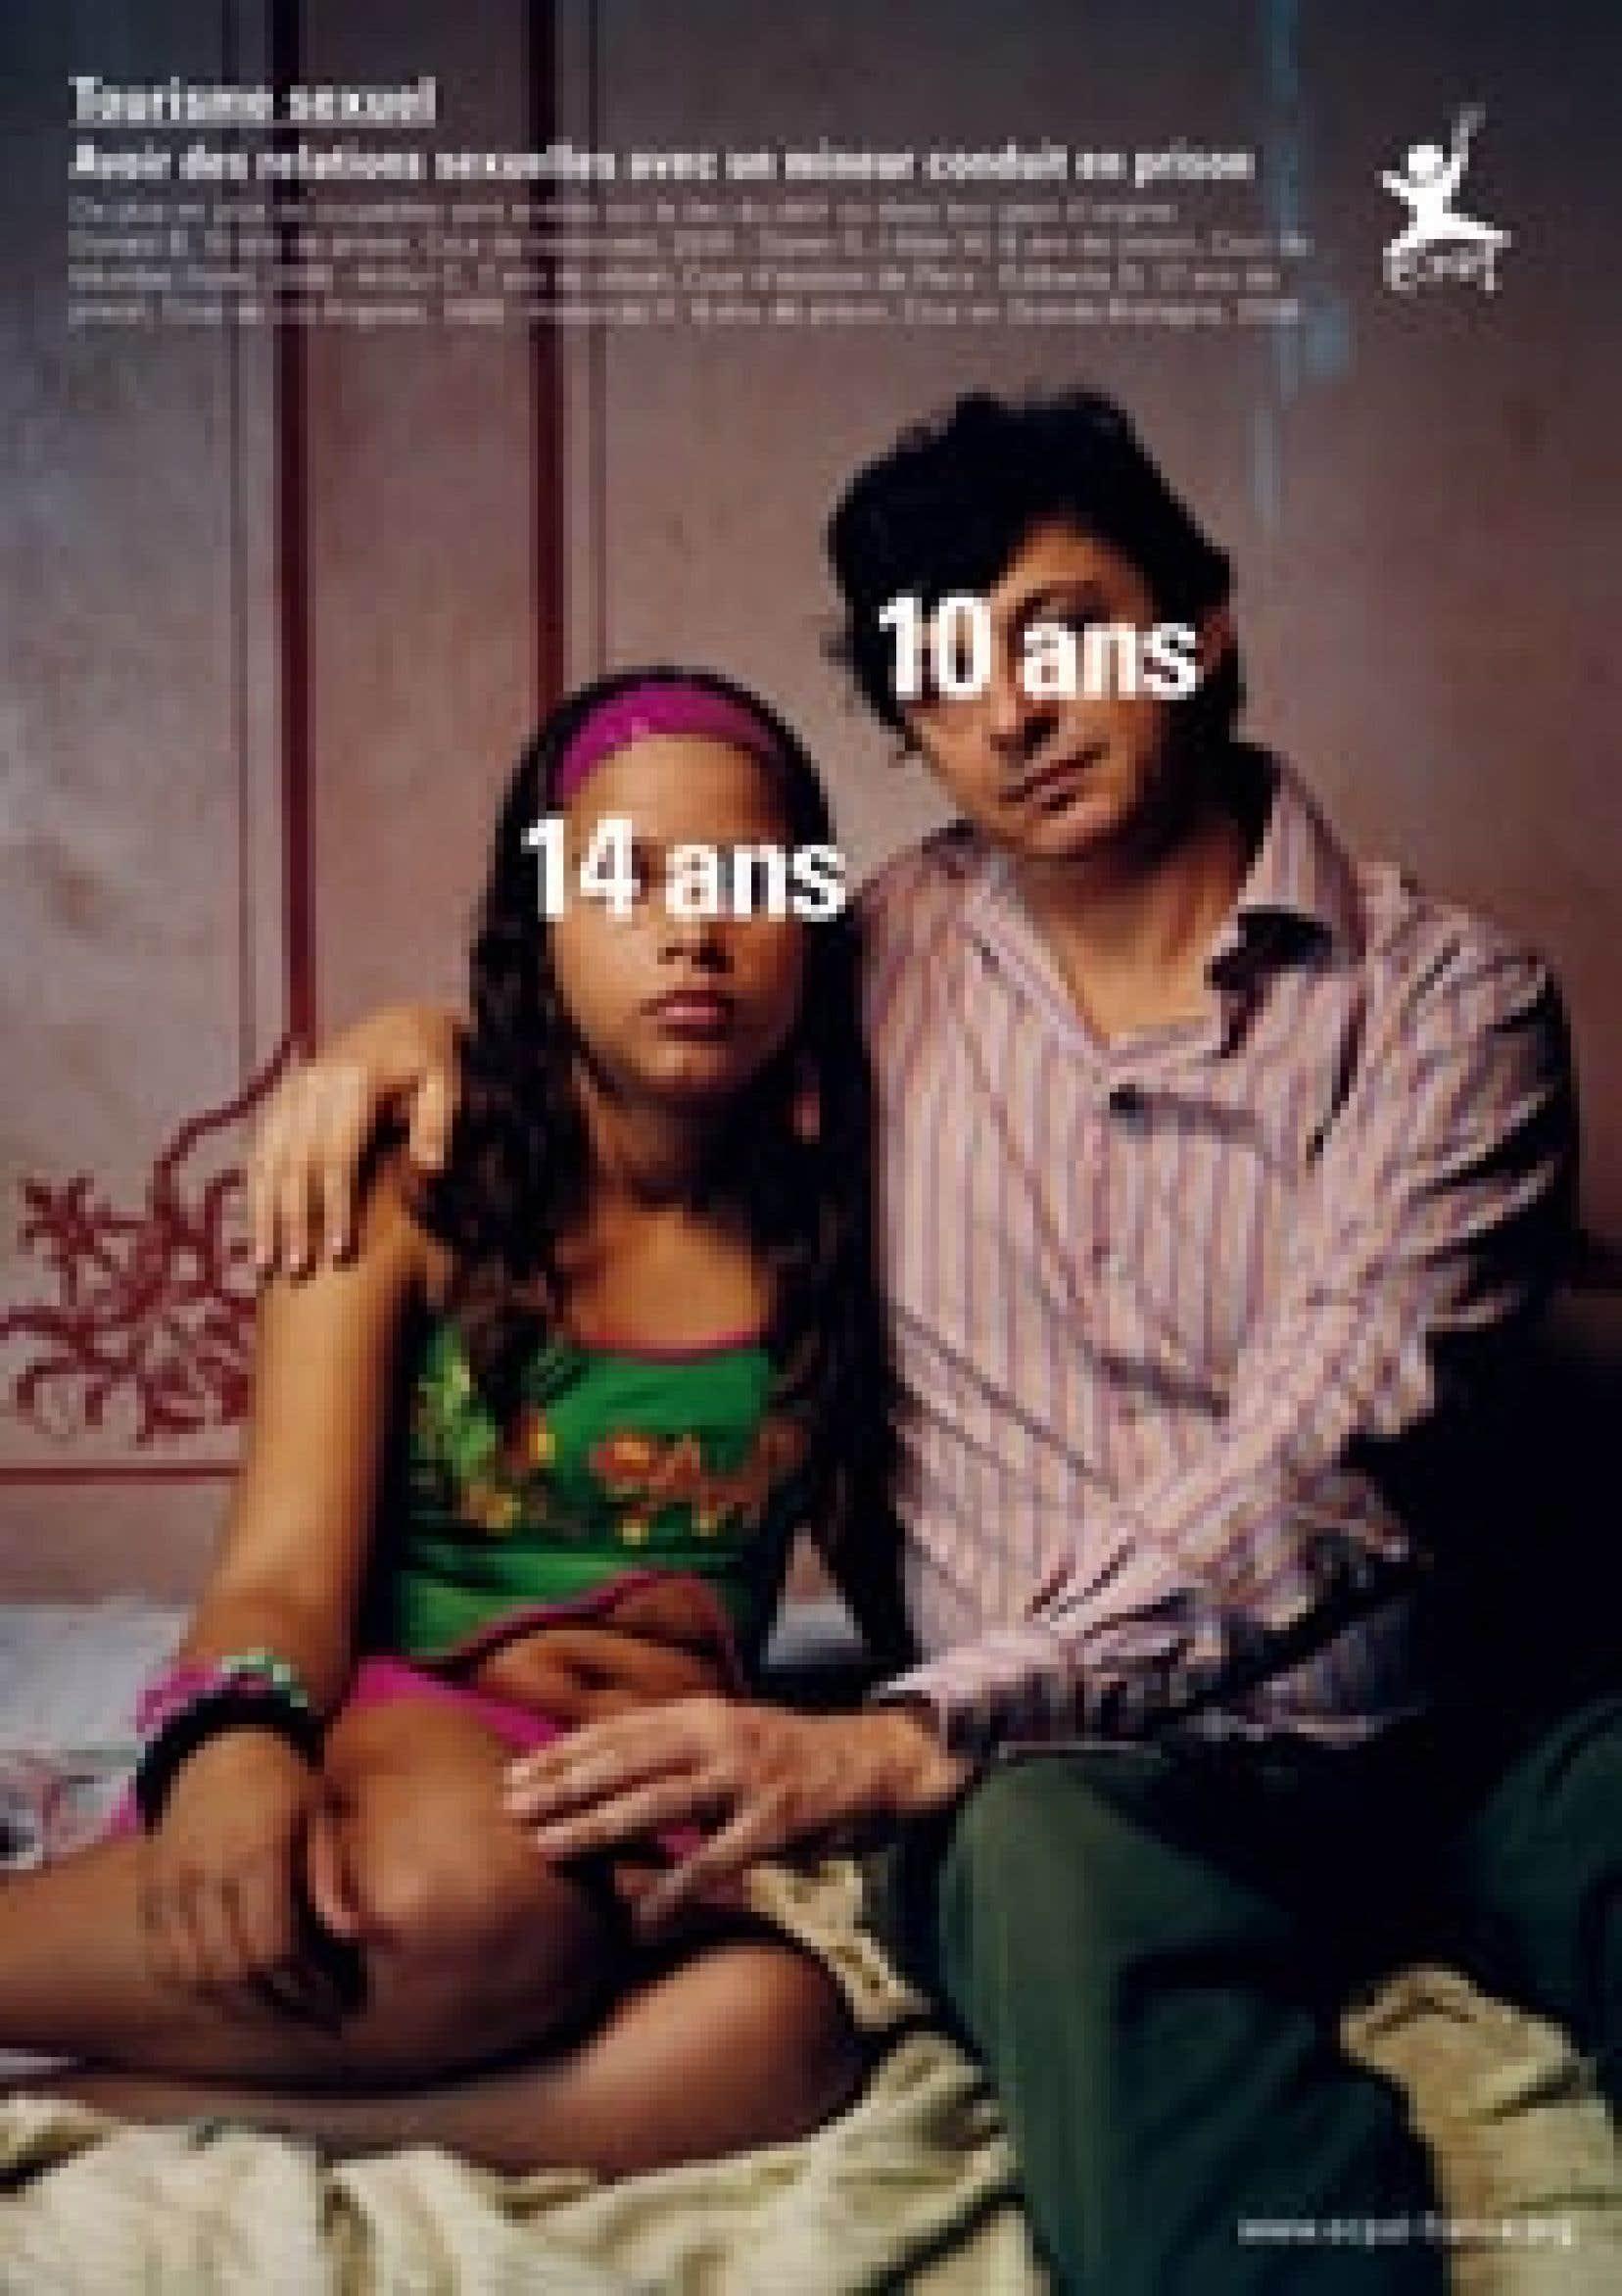 L'affiche de la campagne de l'organisme End Child Prostitution, Child Pornography and Trafficking of Children for Sexual Purposes. Photos: Taryn Simon, BETC Euro RSCG/Air France